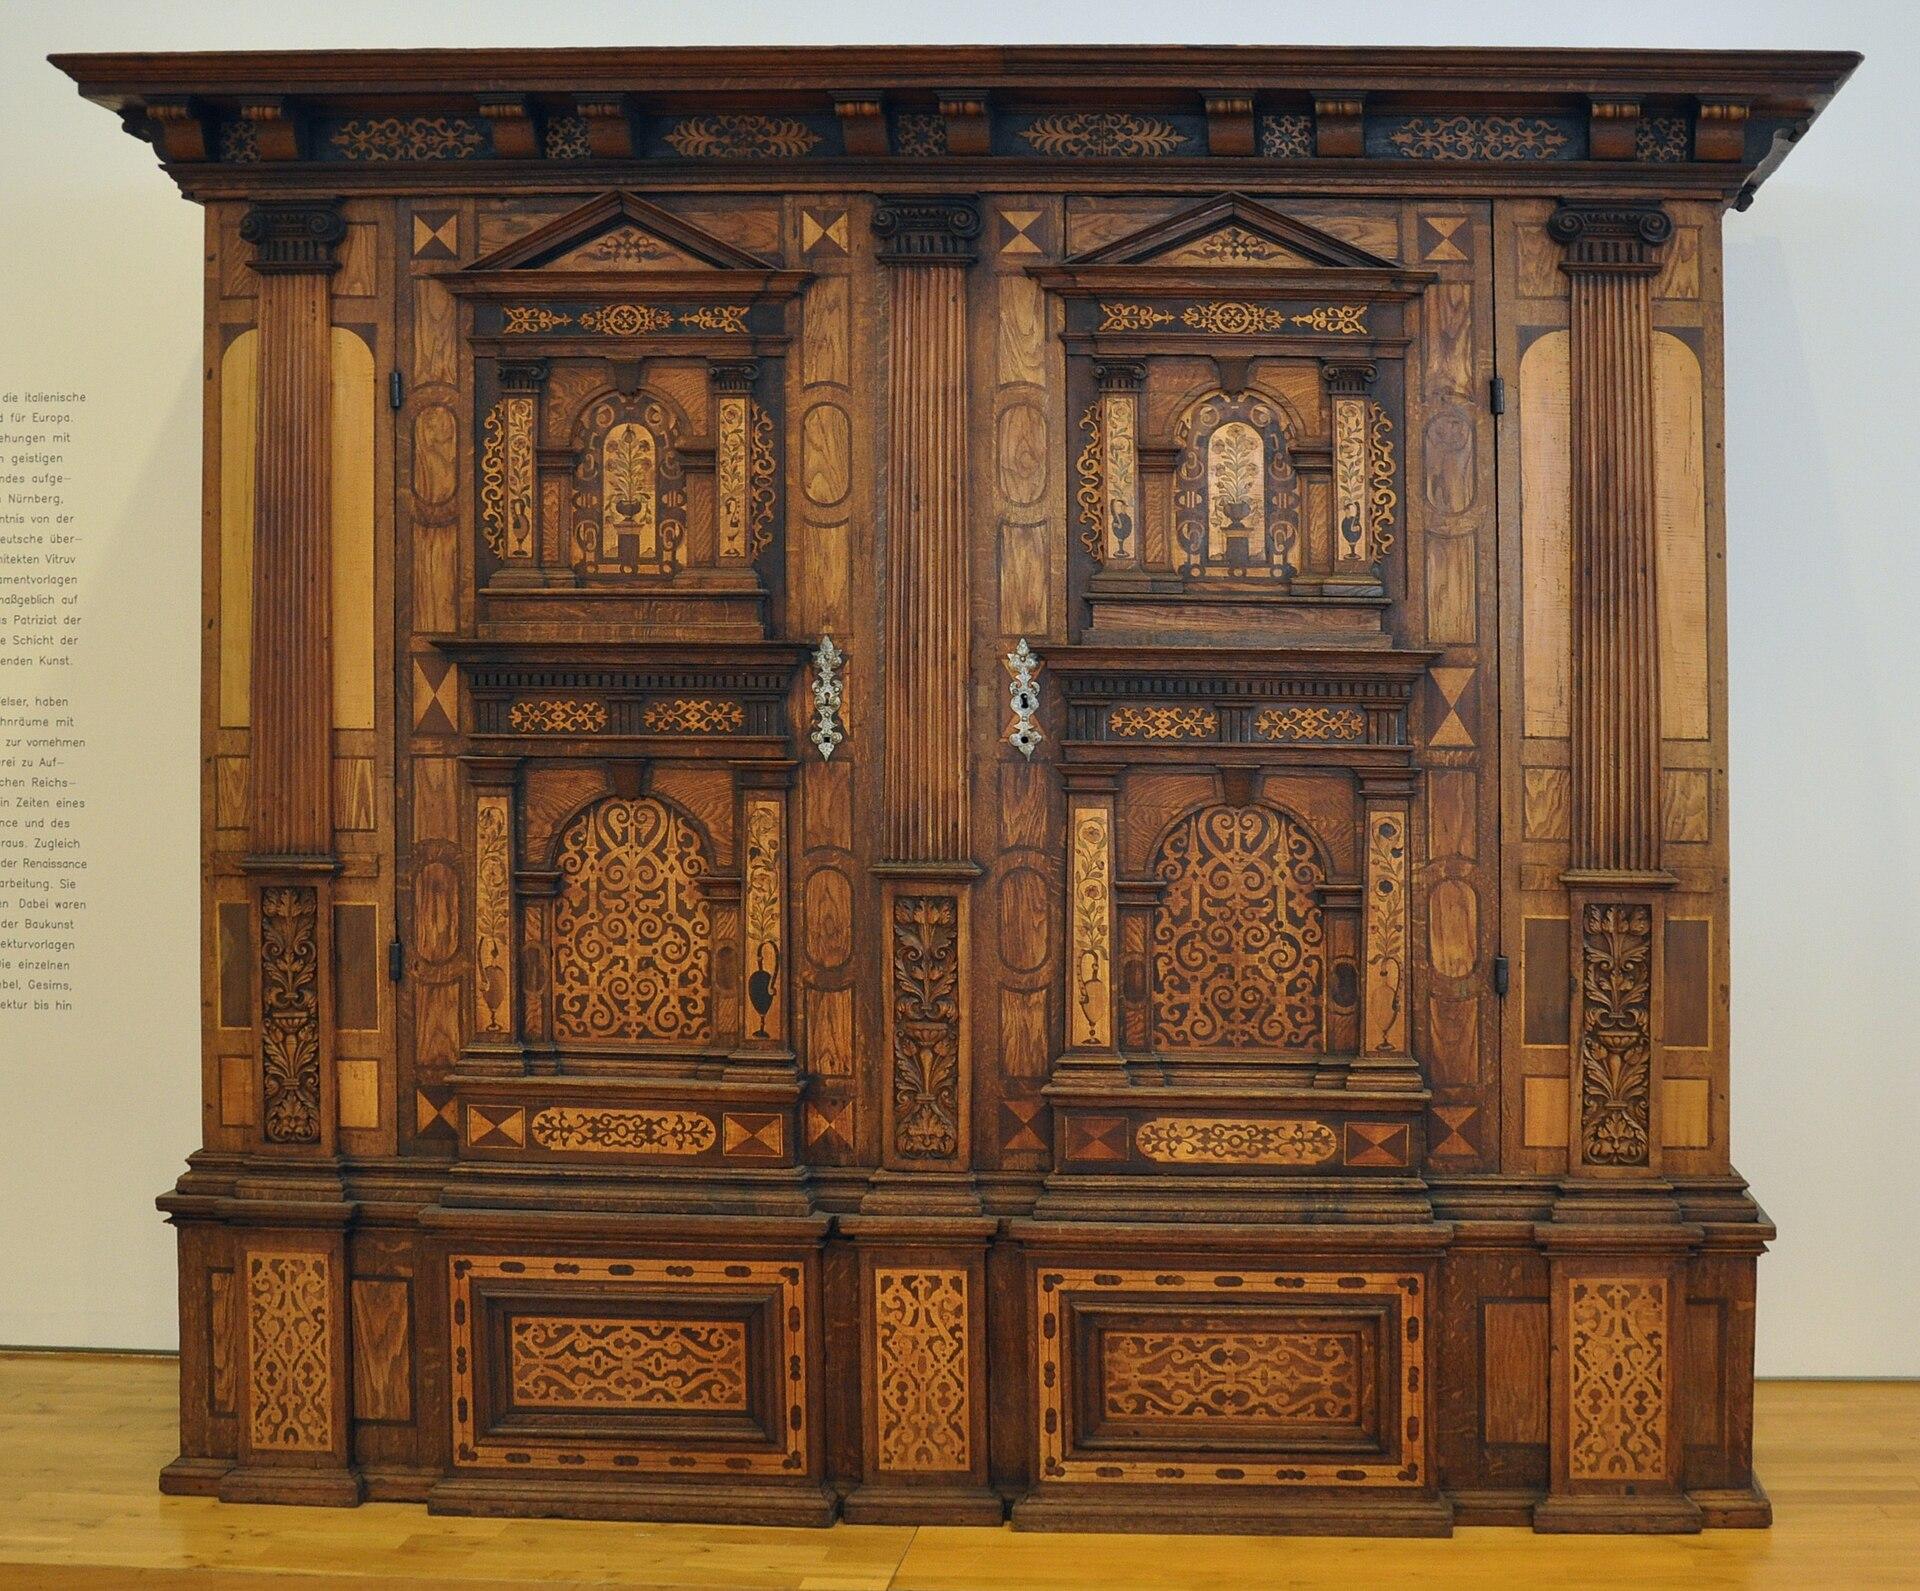 fassadenschrank wikipedia. Black Bedroom Furniture Sets. Home Design Ideas